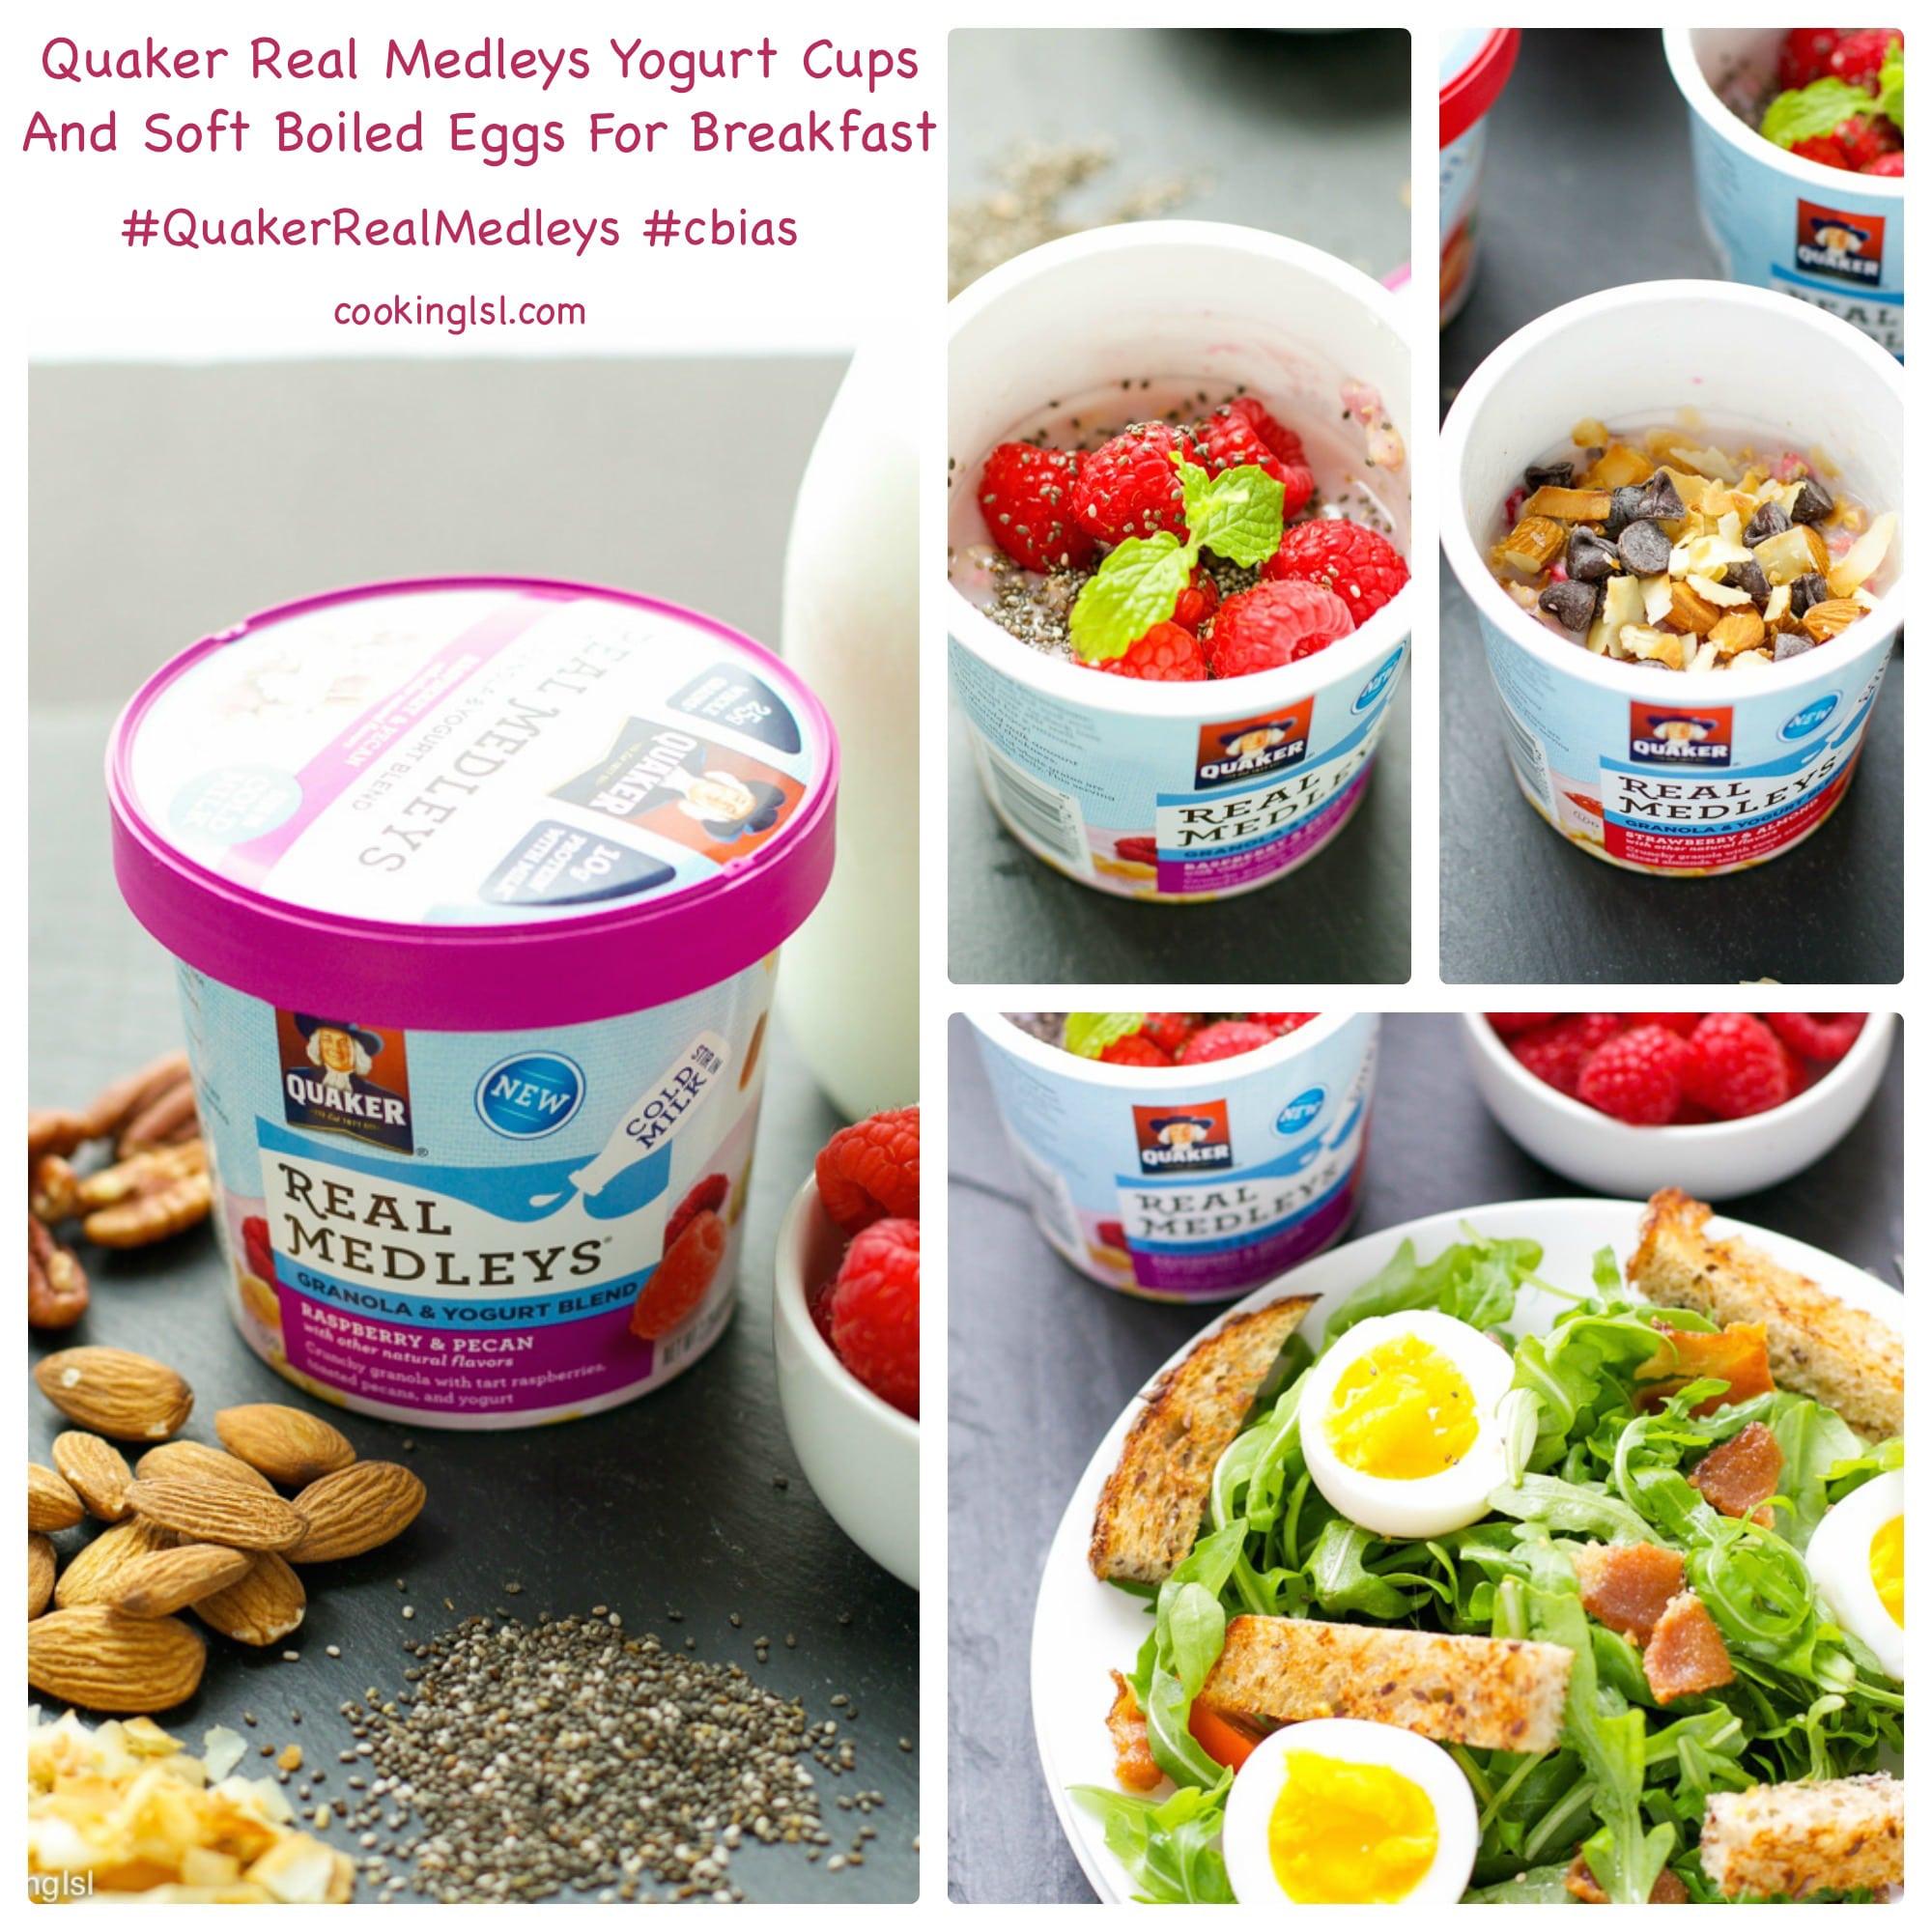 new-quaker-real-medleys-walmart-yogurt-cups